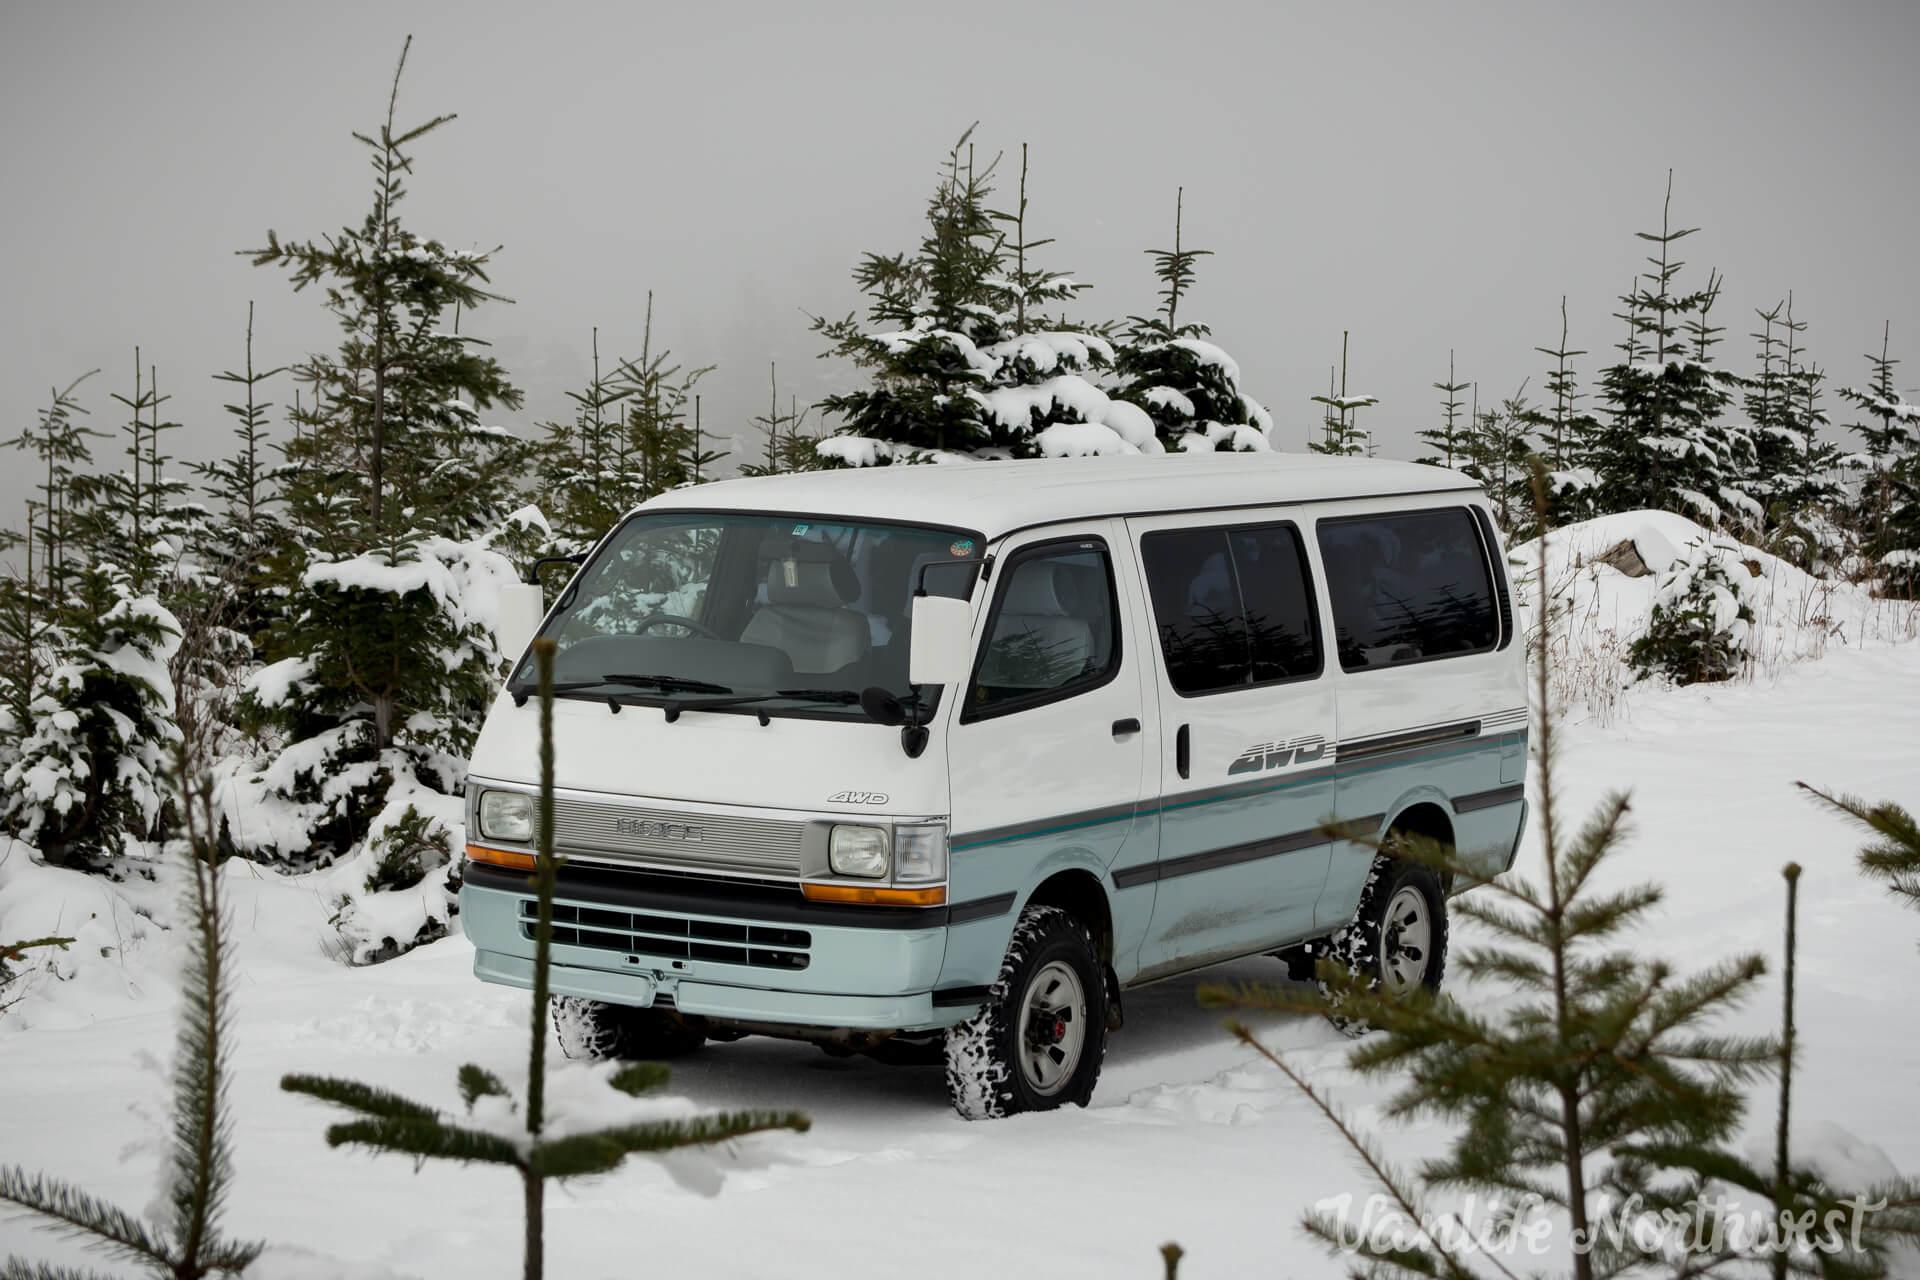 ToyotaHiaceLH119-JoeH-cover-1.jpg